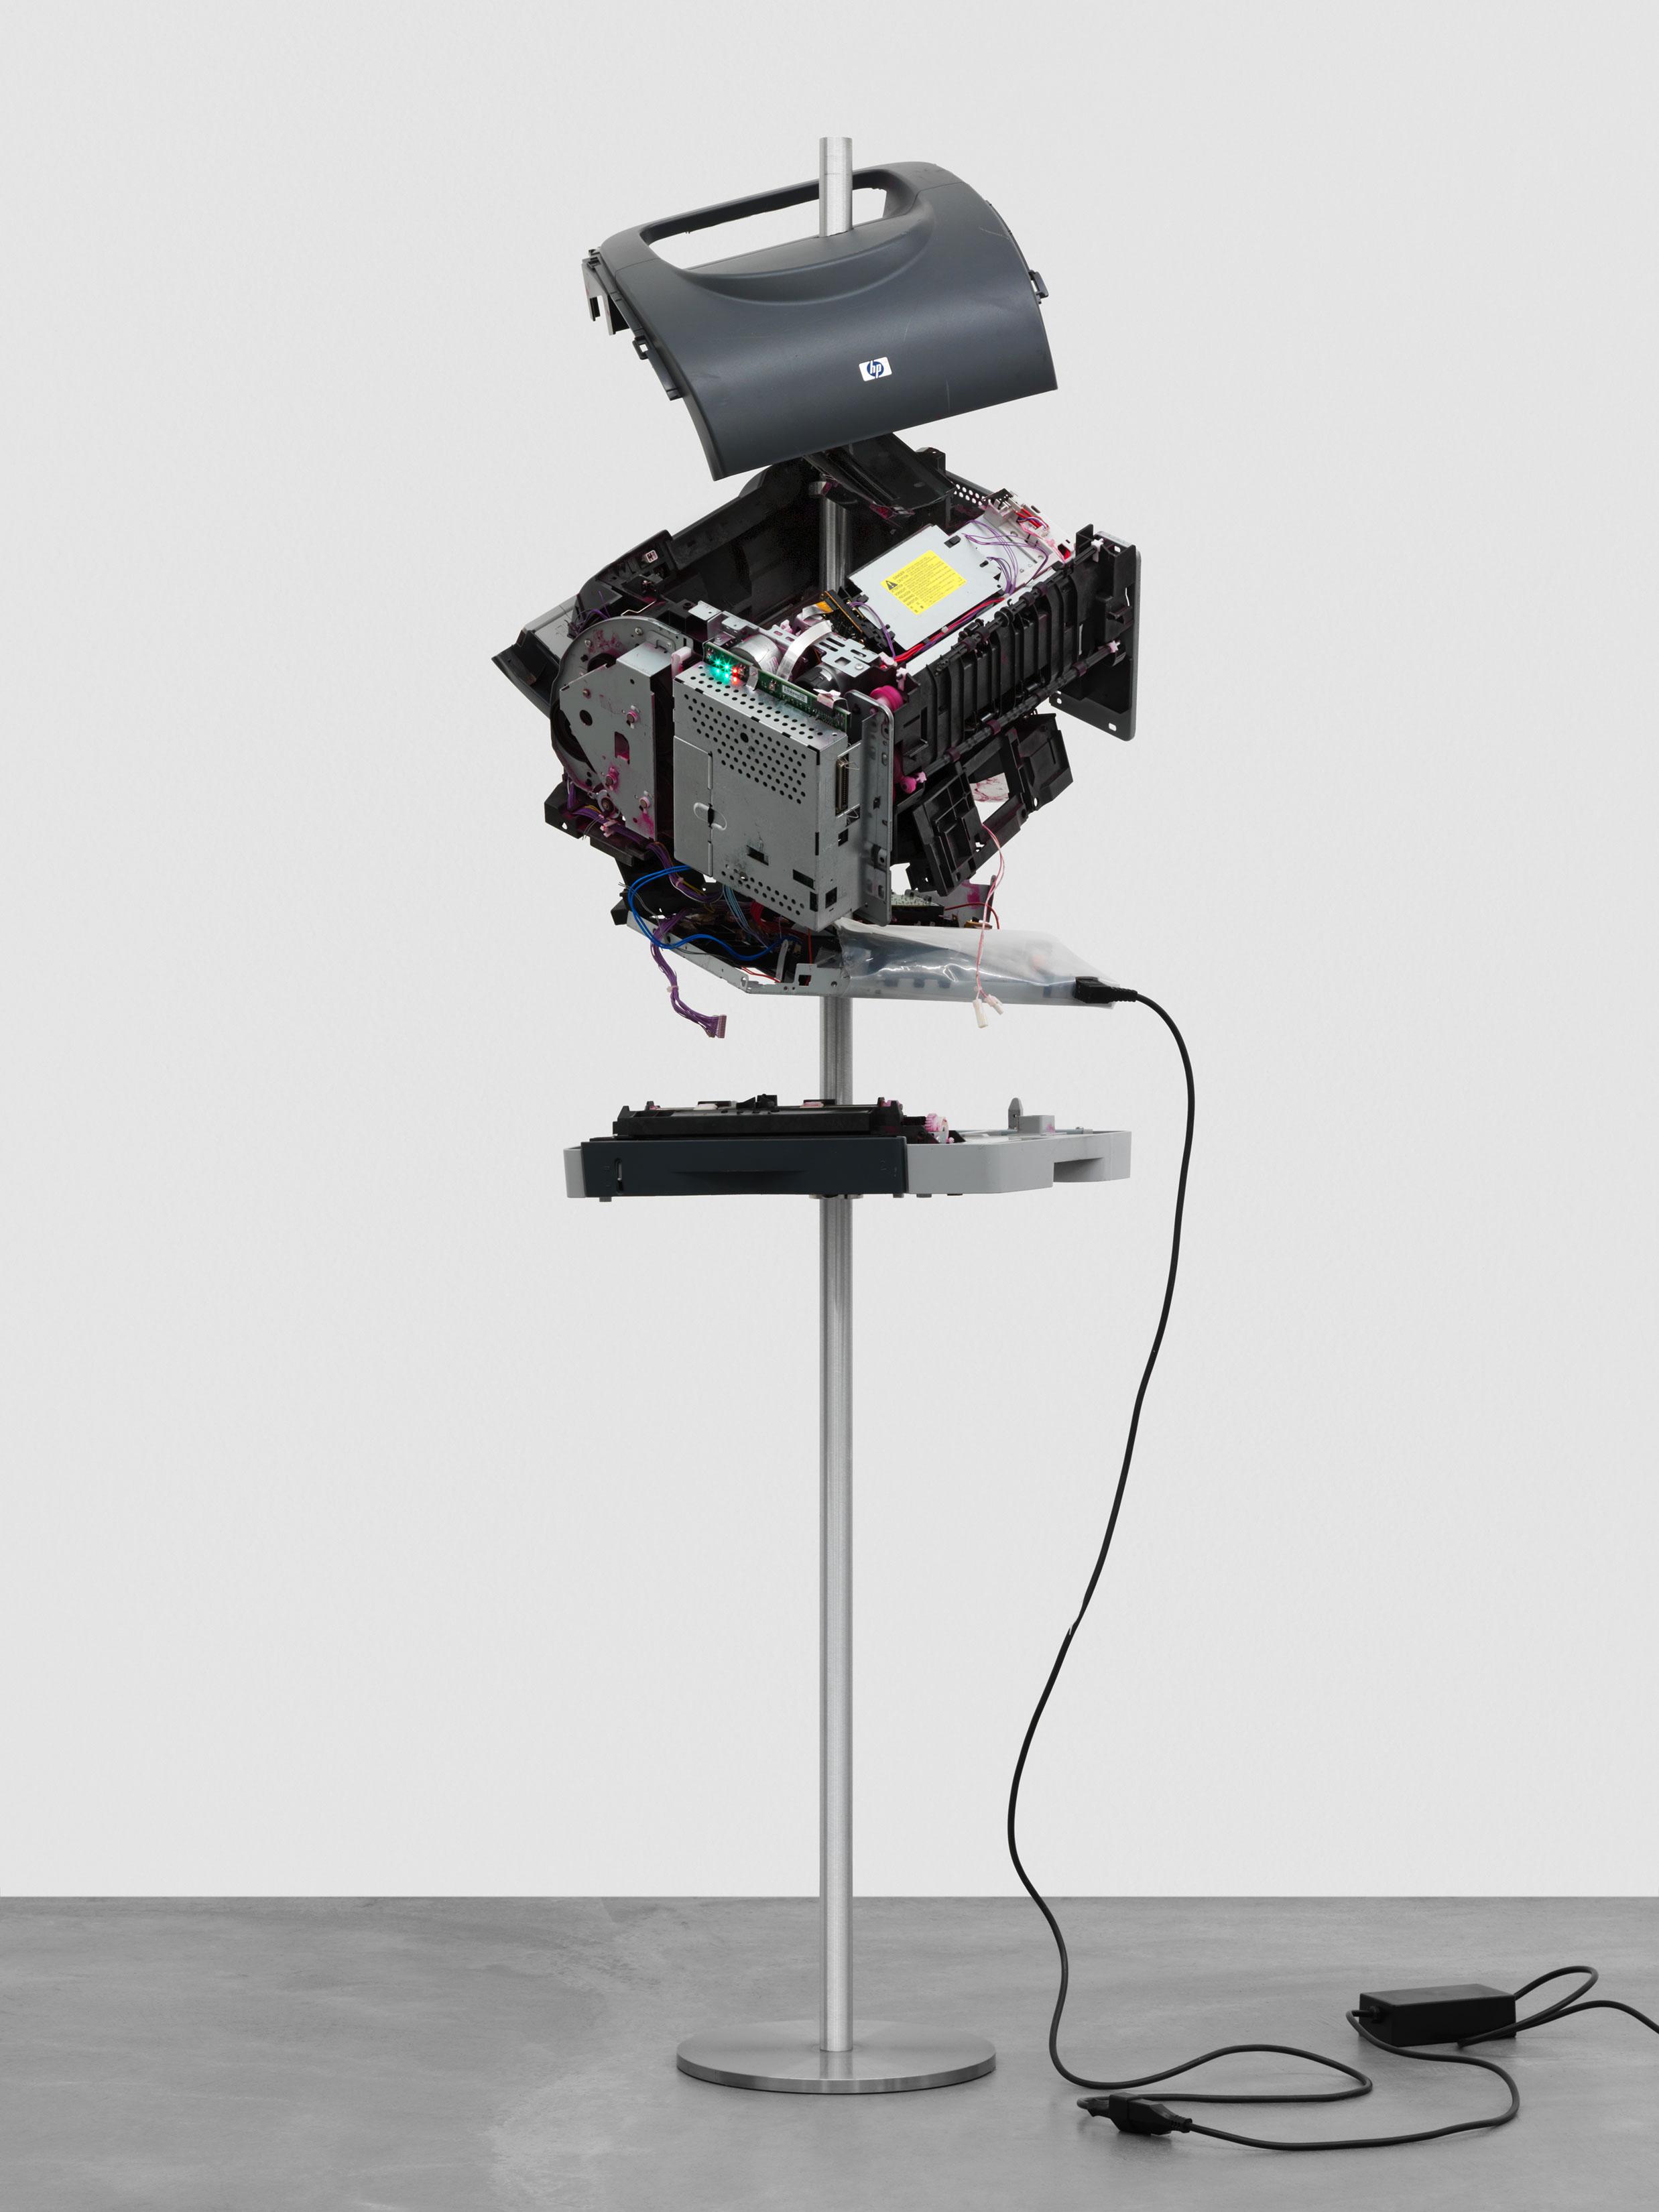 Office Work (<del>HP Color LaserJet 2250 N</del>)